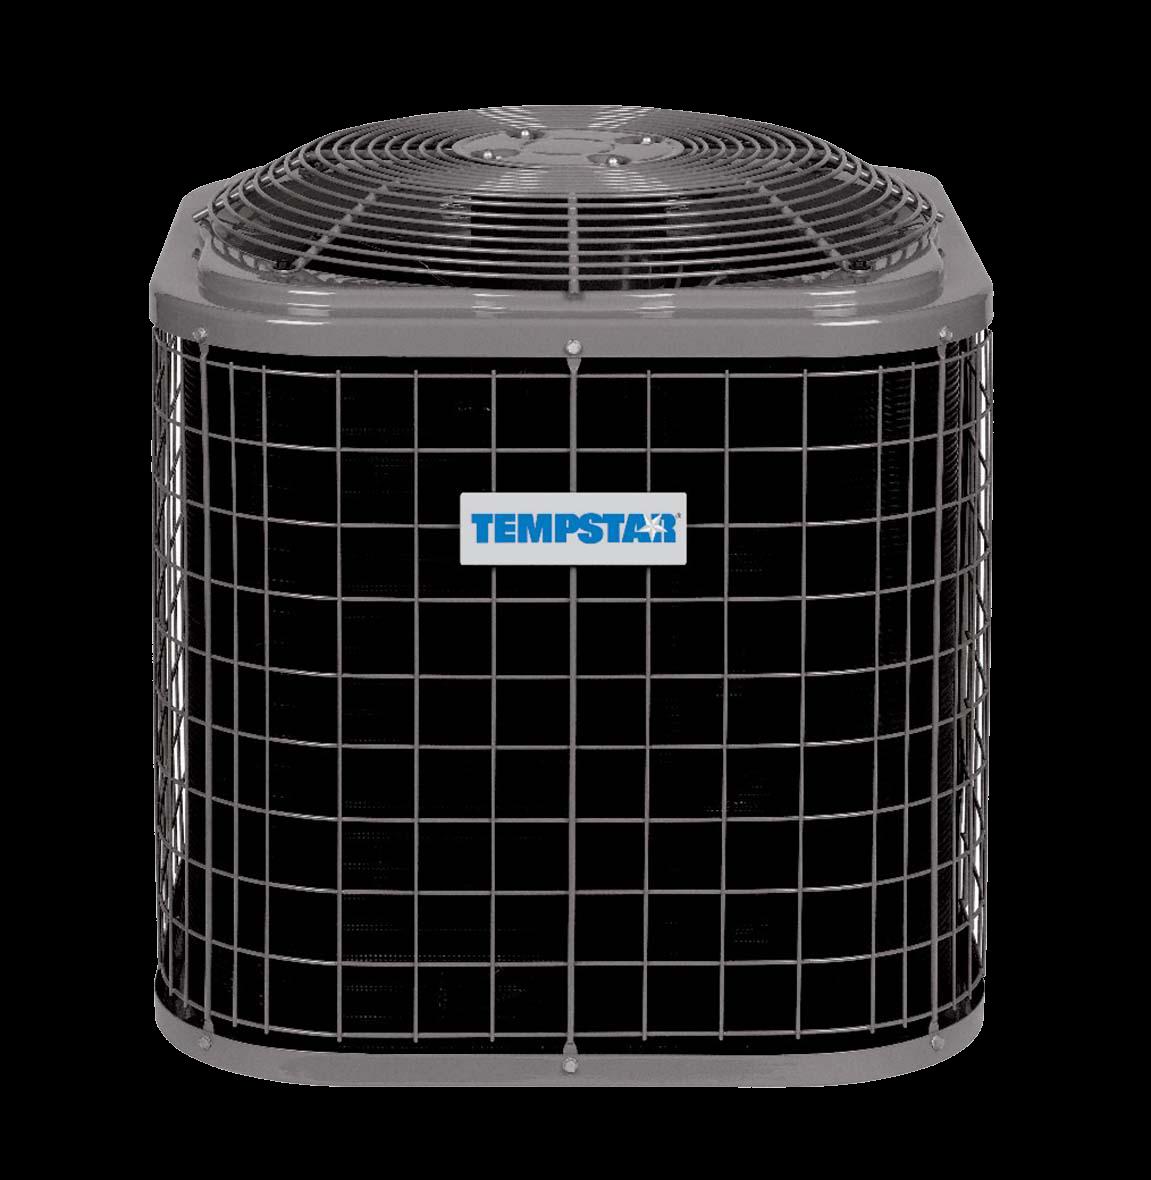 N4a5 Central Air Conditioner Ac Unit Tempstar